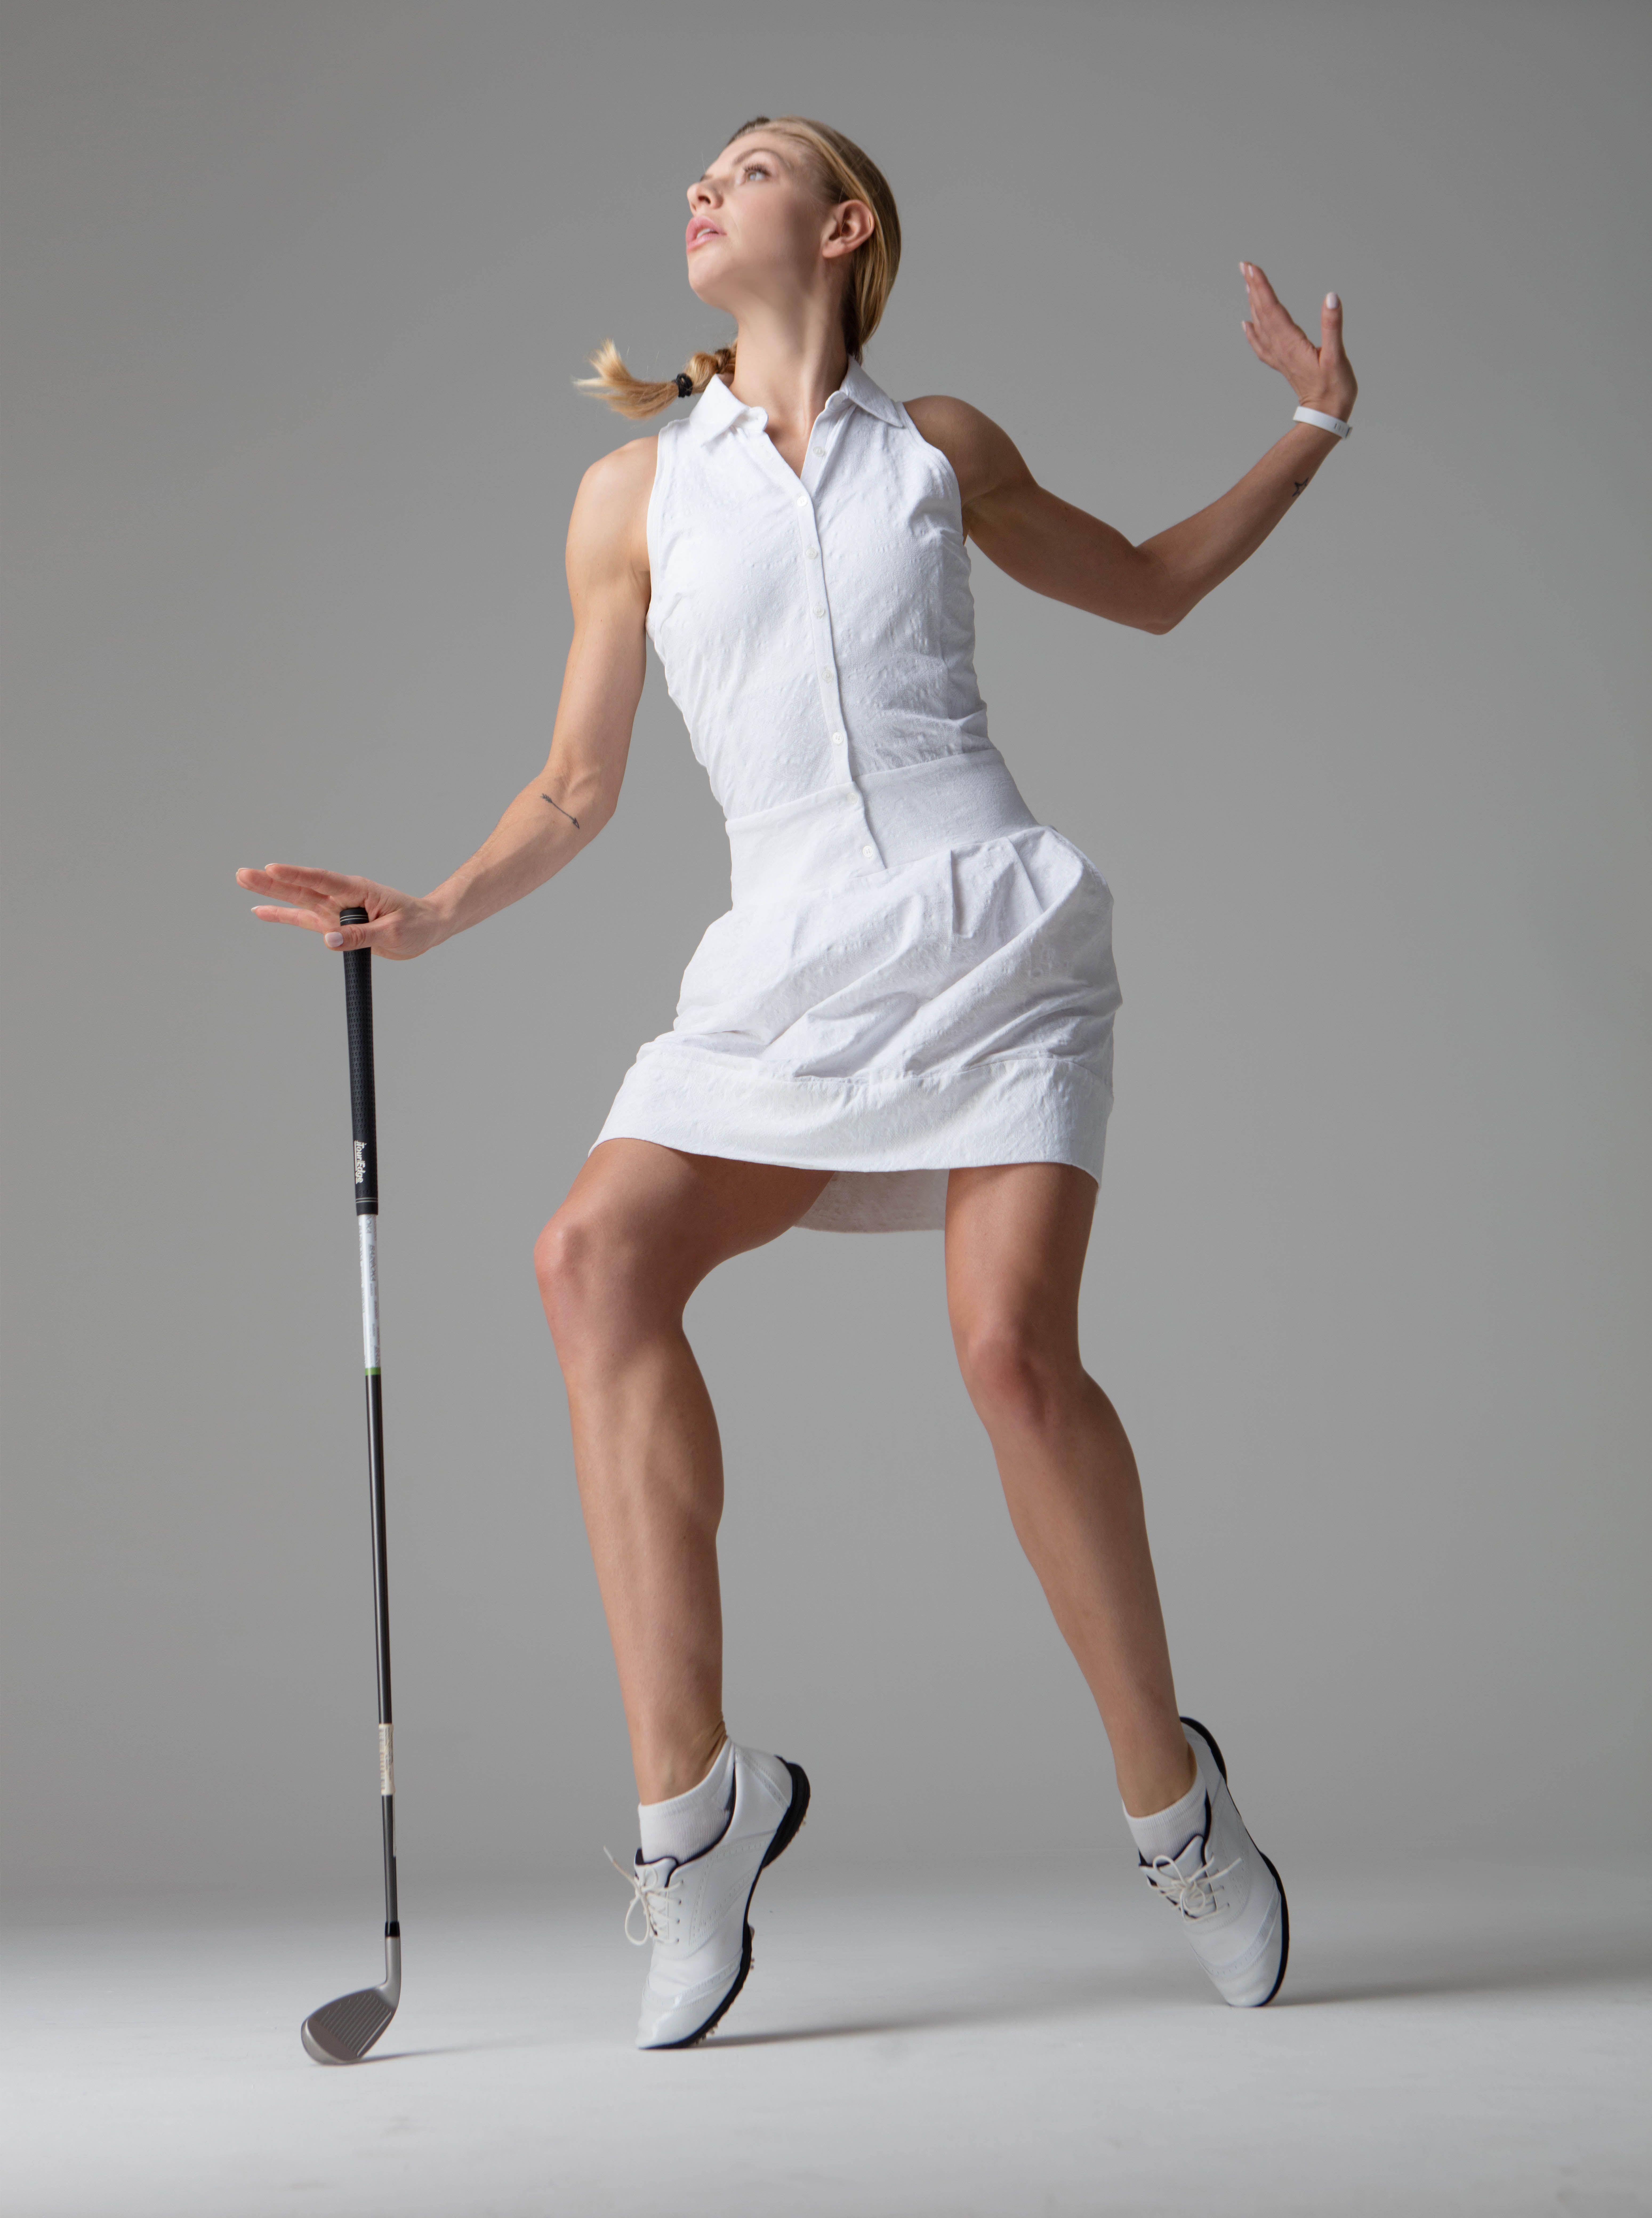 L 39 Etoile Sport A New Line Of Luxury Tennis Apparel Tennis Clothes Apparel Dresses